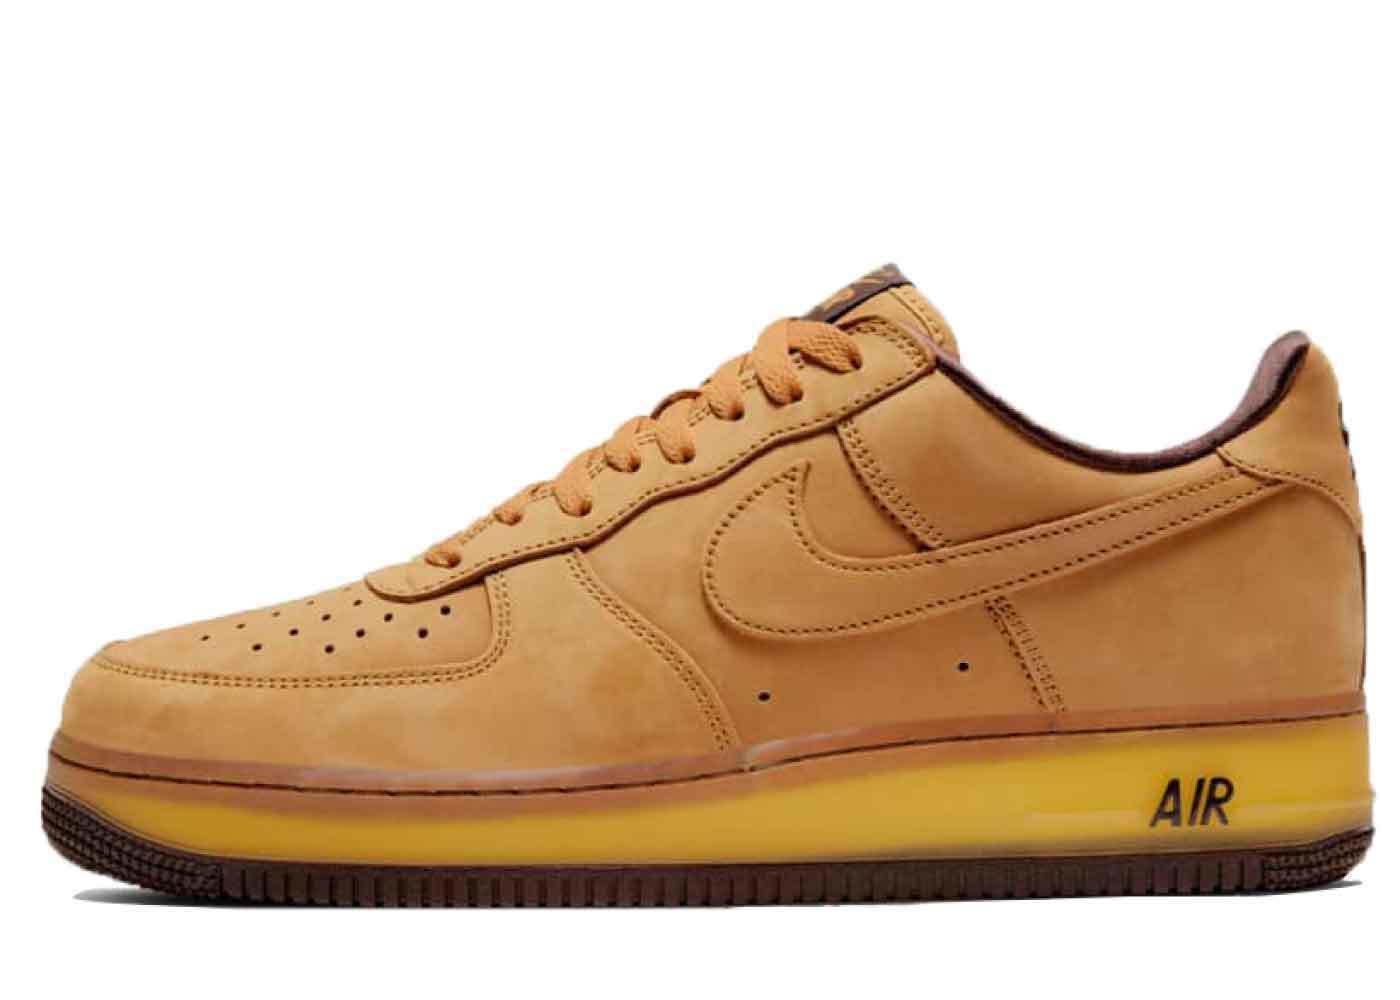 Nike Air Force 1 Retro SP Wheat Mochaの写真